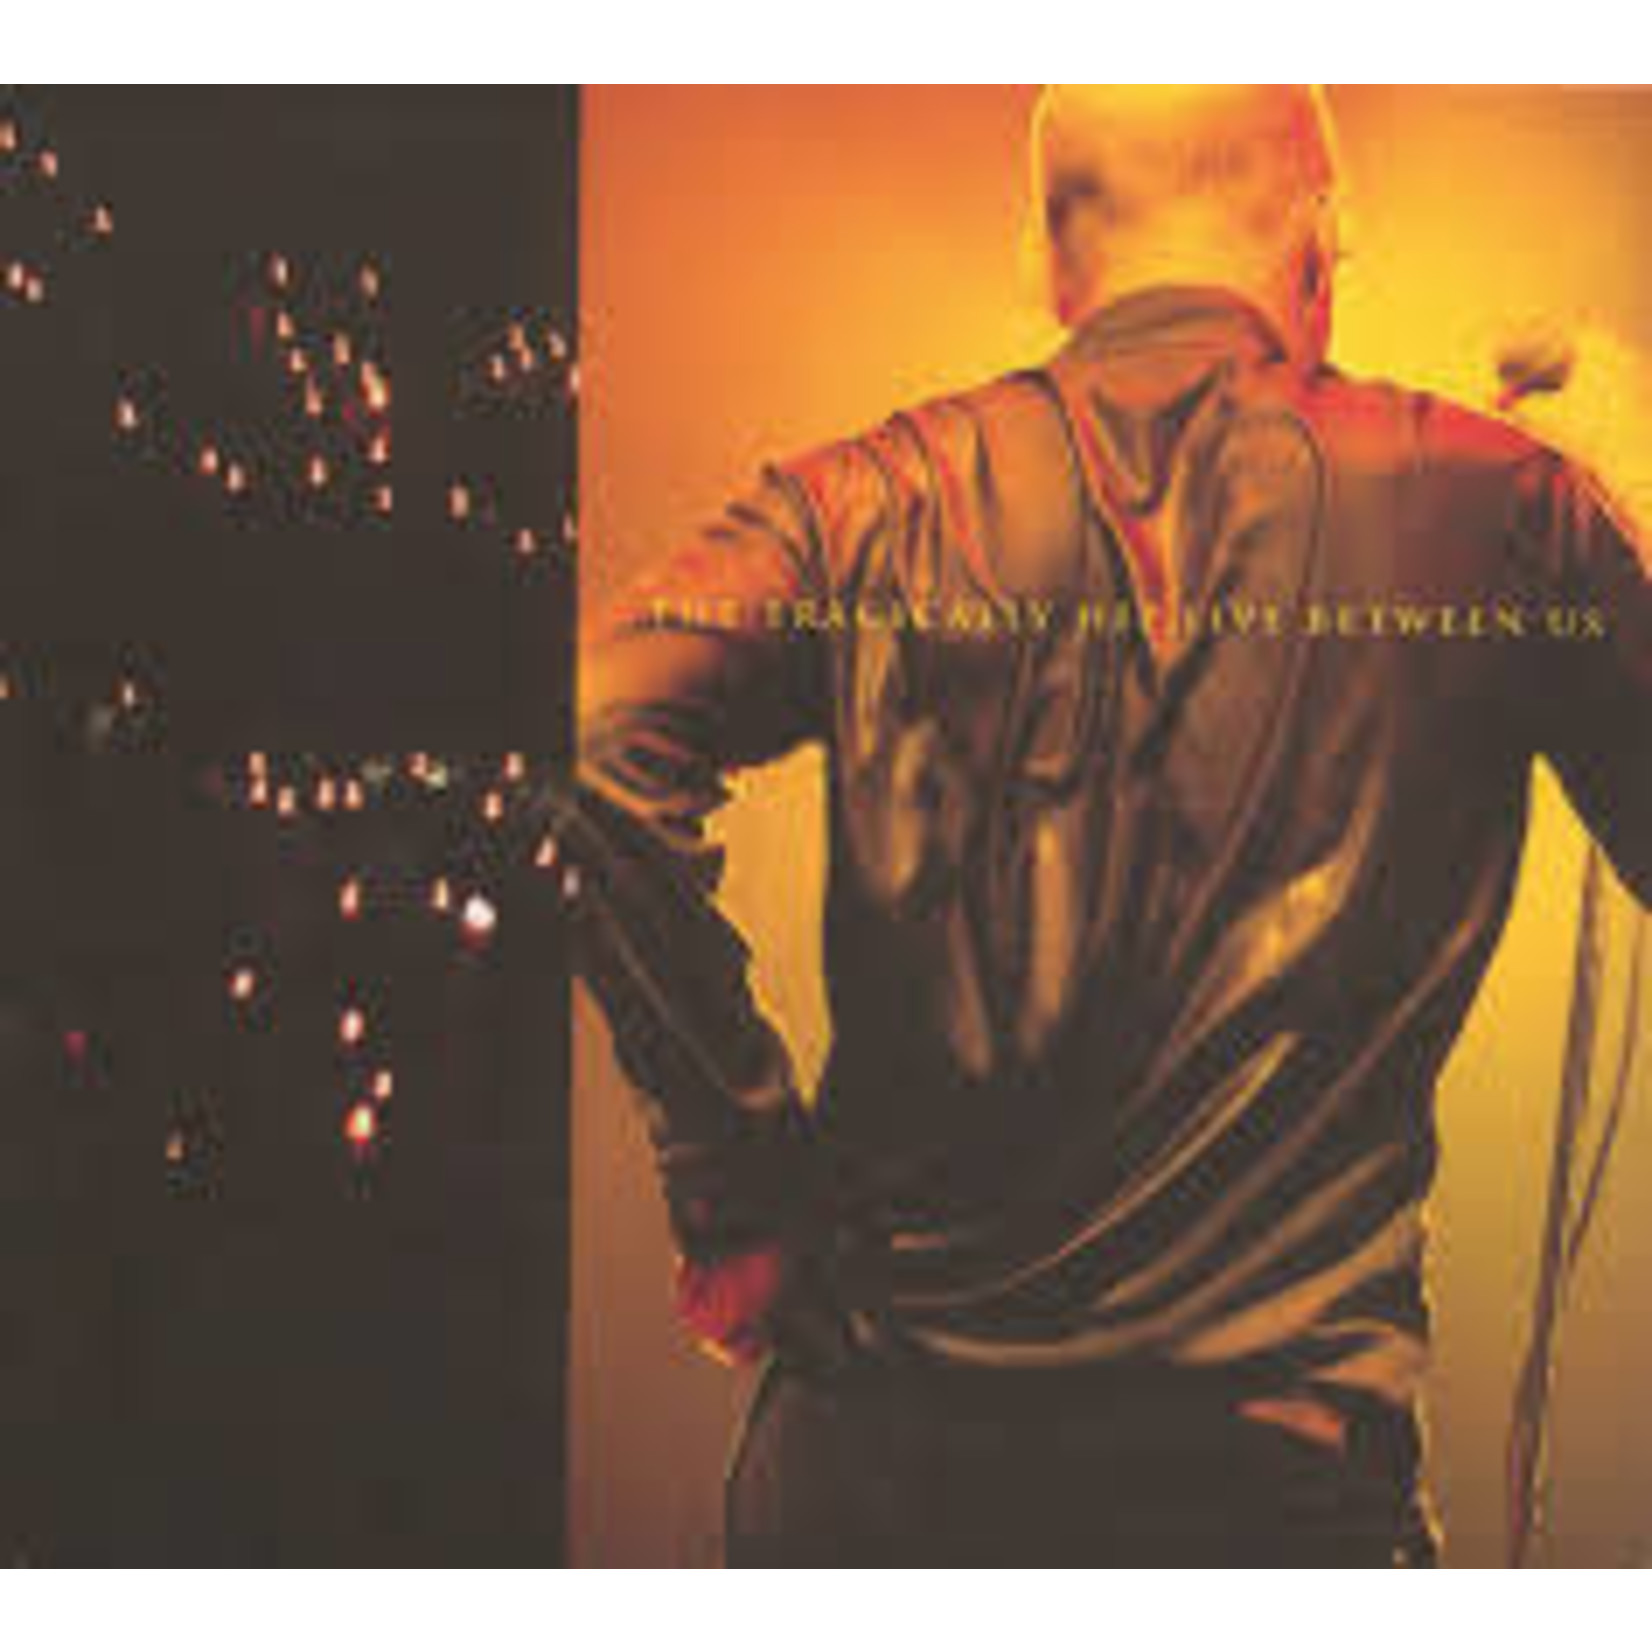 Vinyl Tragically Hip - Live Between Us